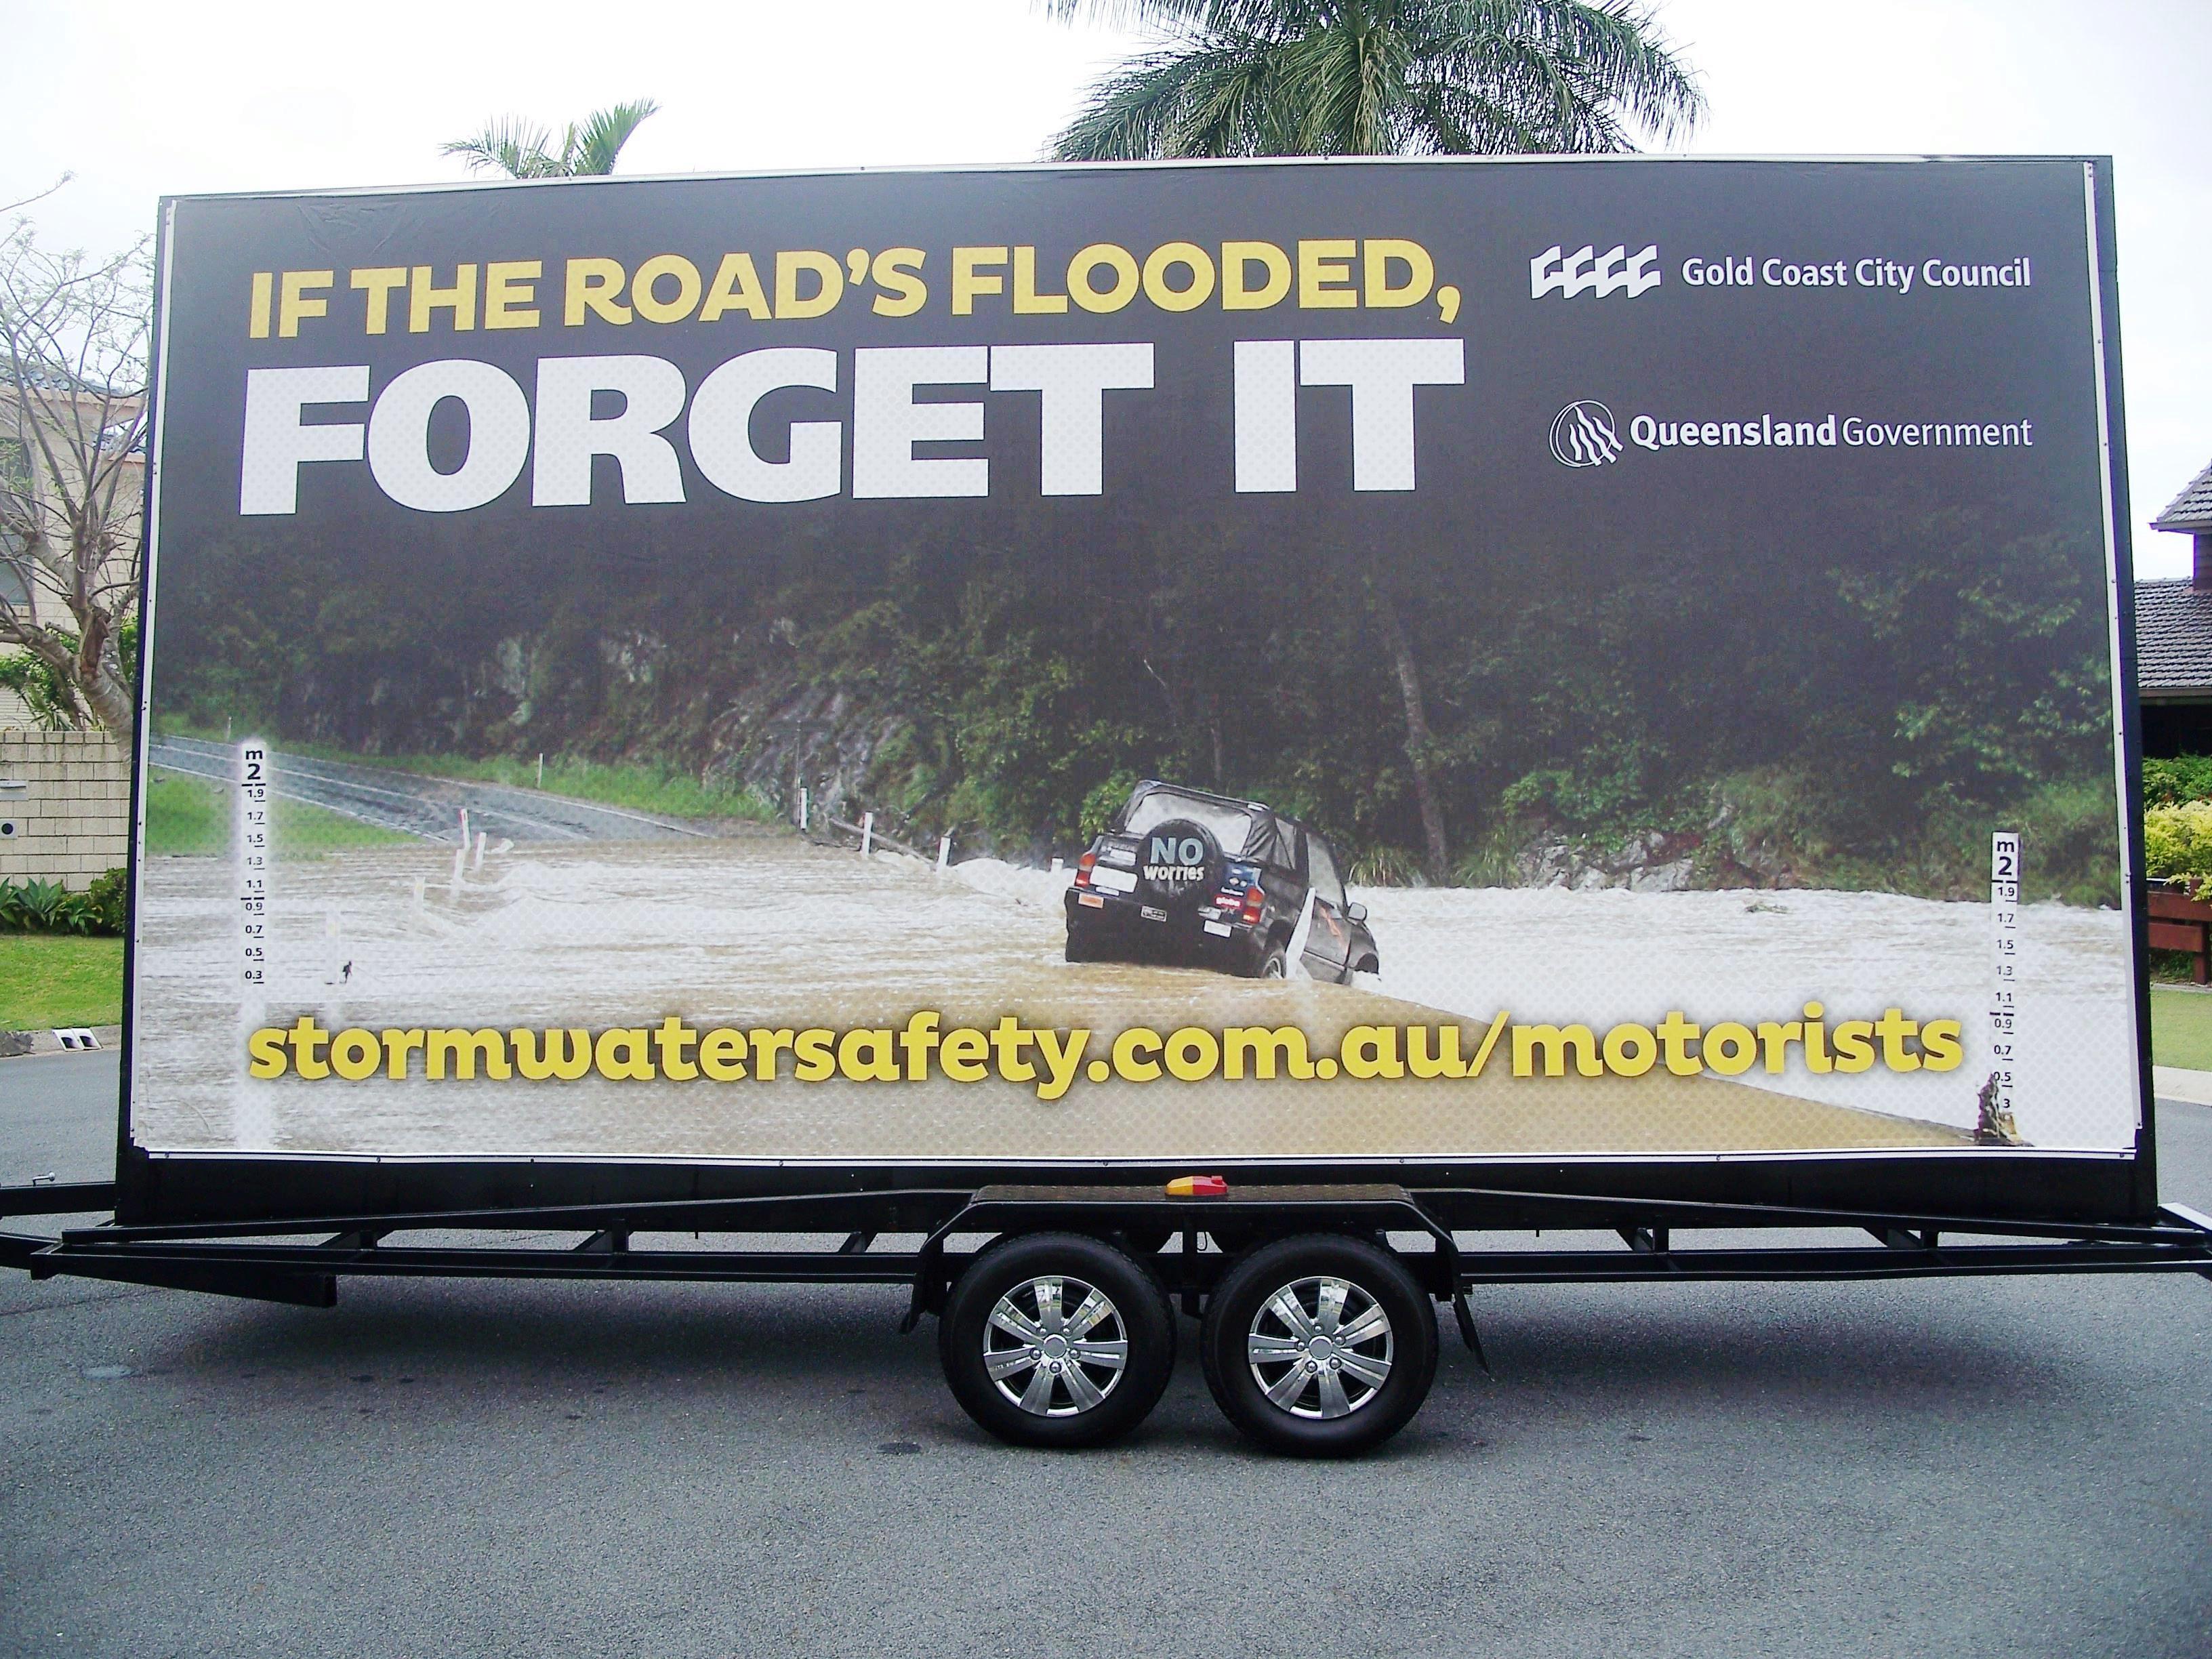 Mobile Billboard Business For Sale in Queensland